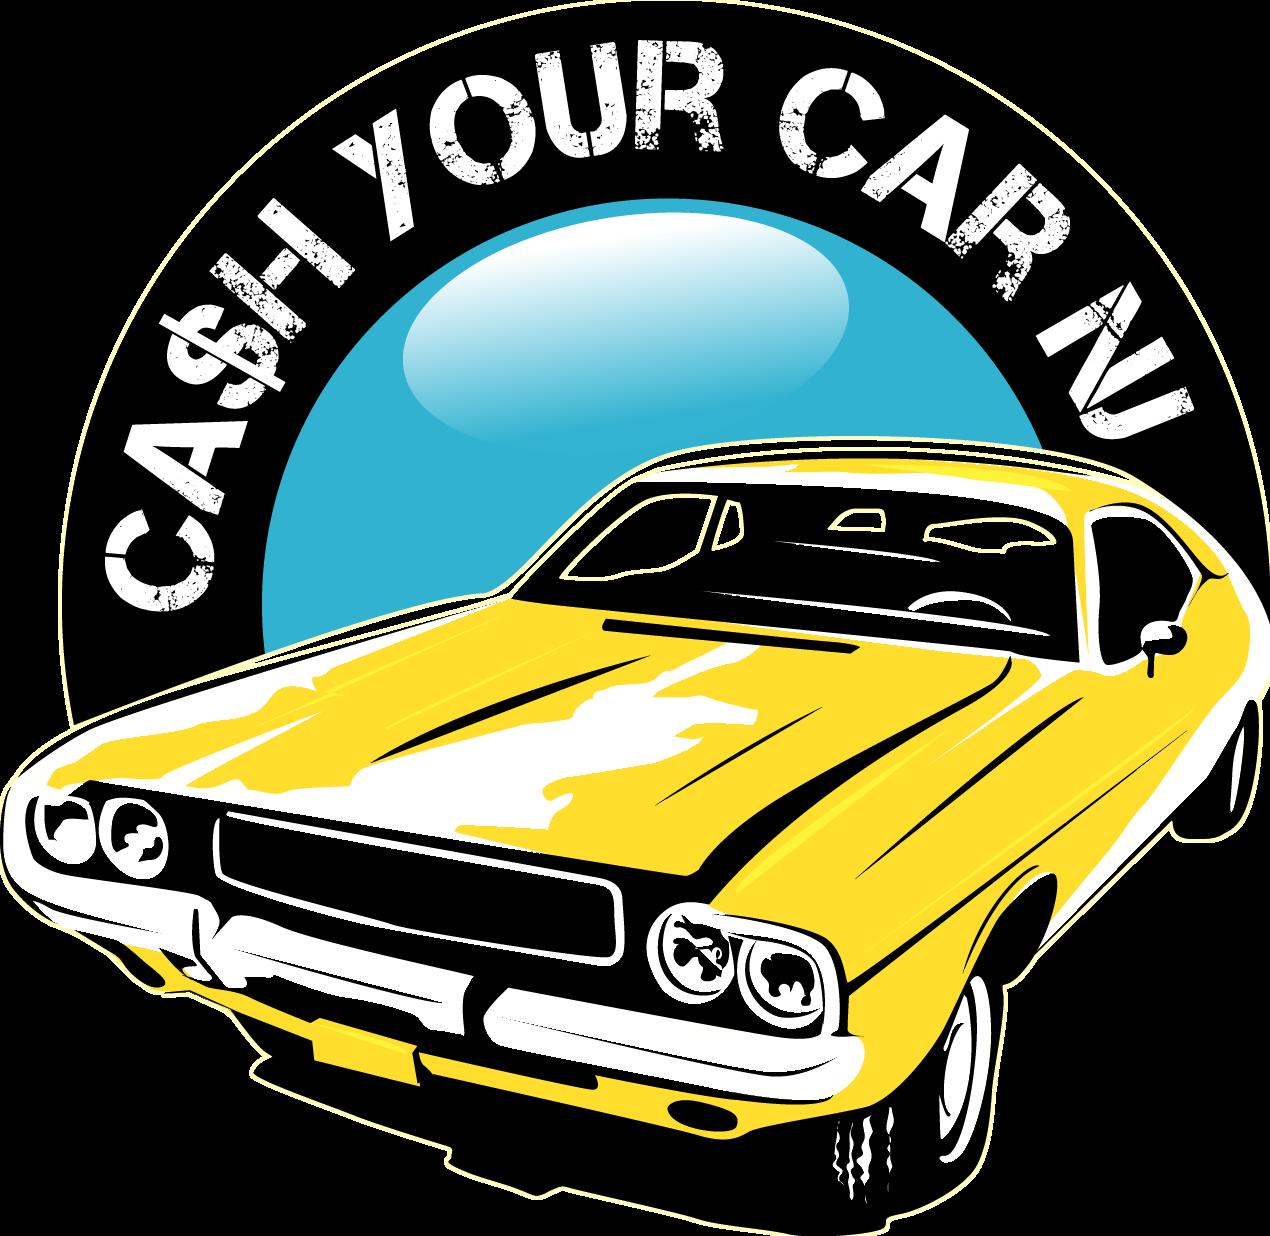 Cash For Cars Canada   Fast Cash For Cars Toronto   Scrap Car ...